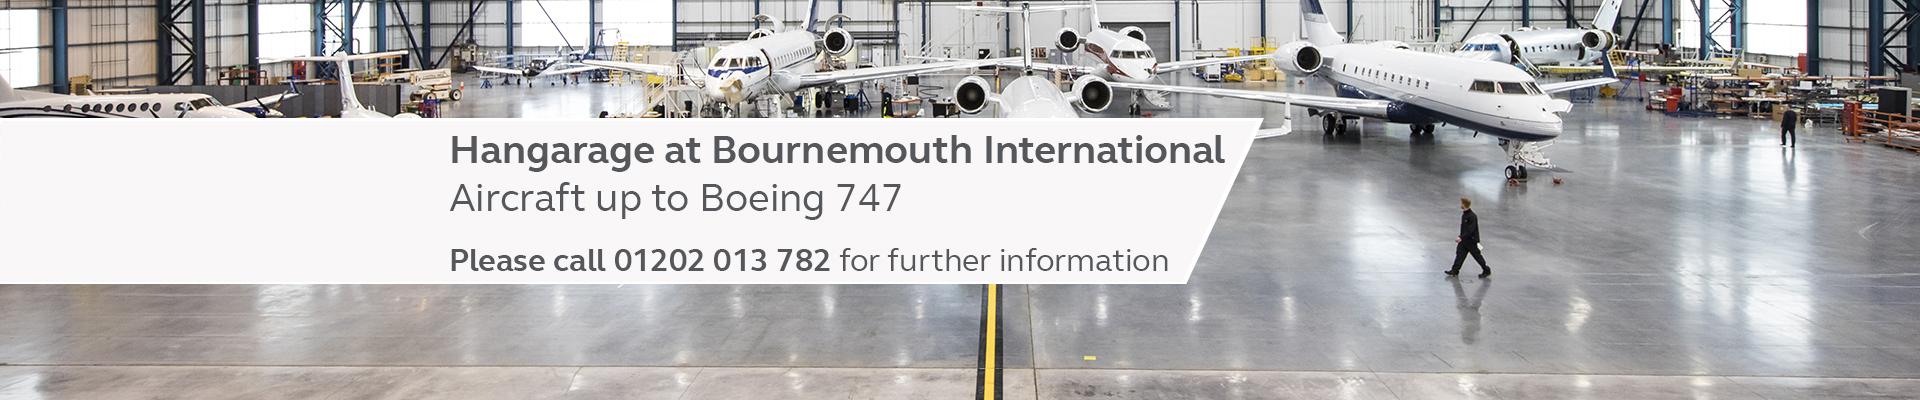 Bournemouth International Airport (EGHH) 4